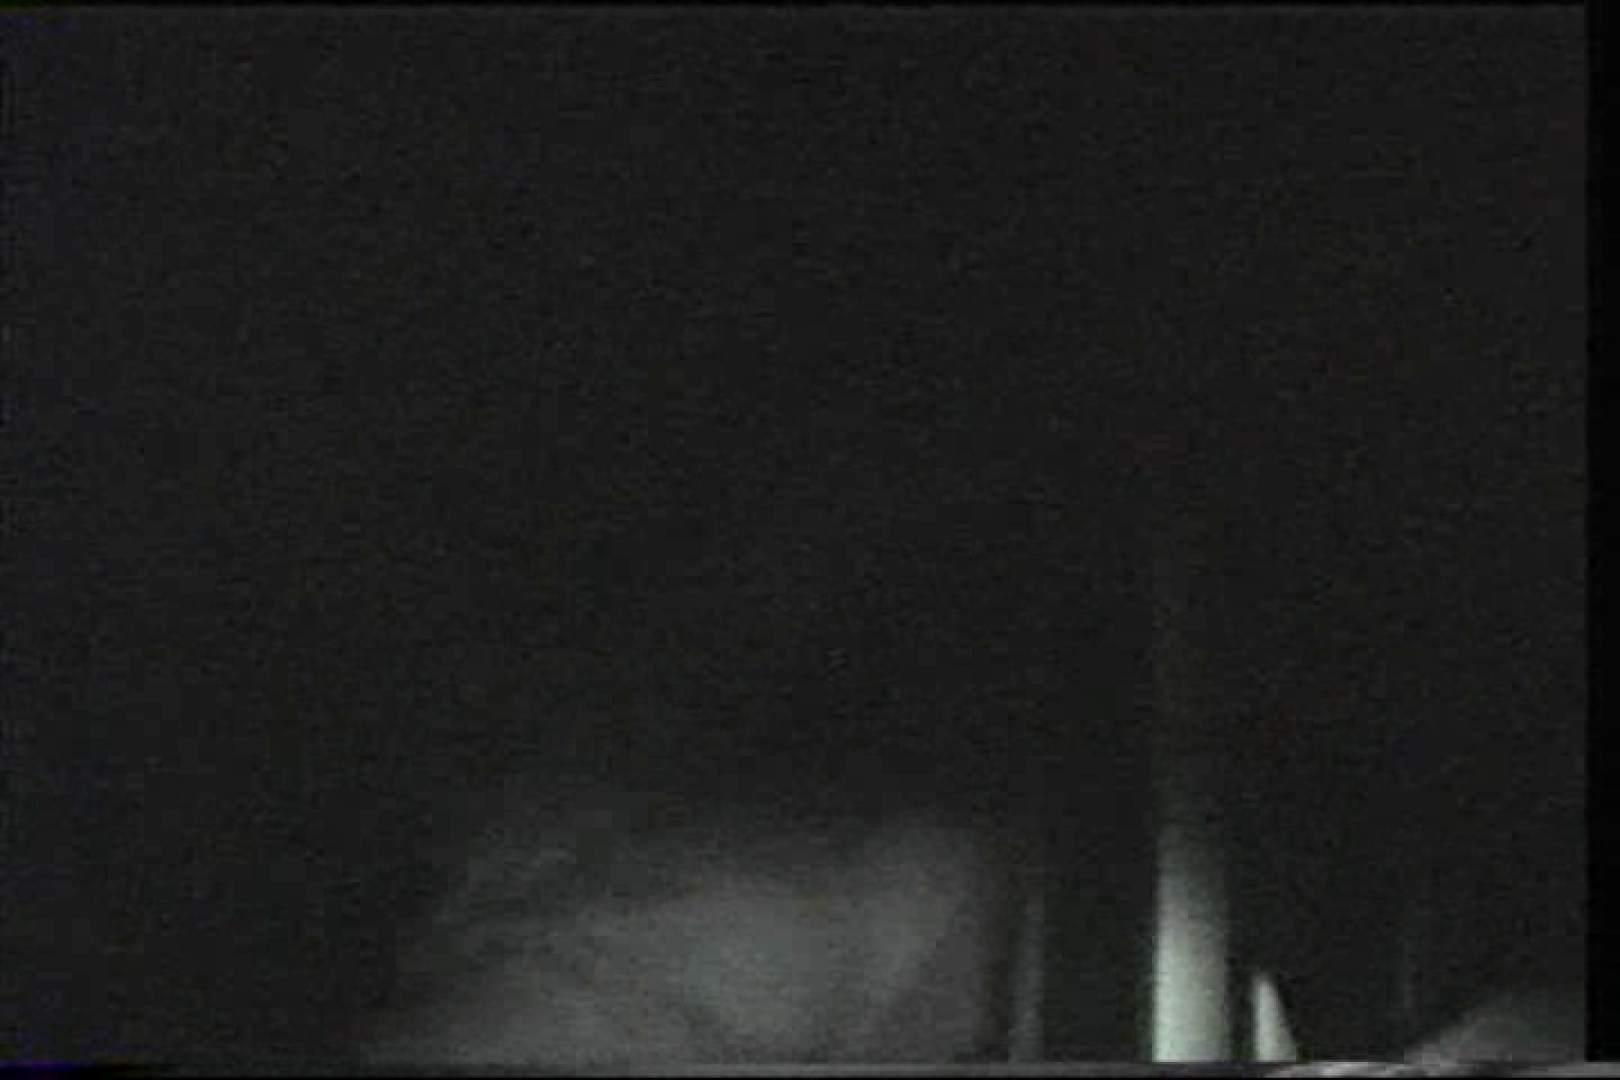 MASAさんの待ち伏せ撮り! 赤外線カーセックスVol.2 エロティックなOL 盗撮動画紹介 72画像 2